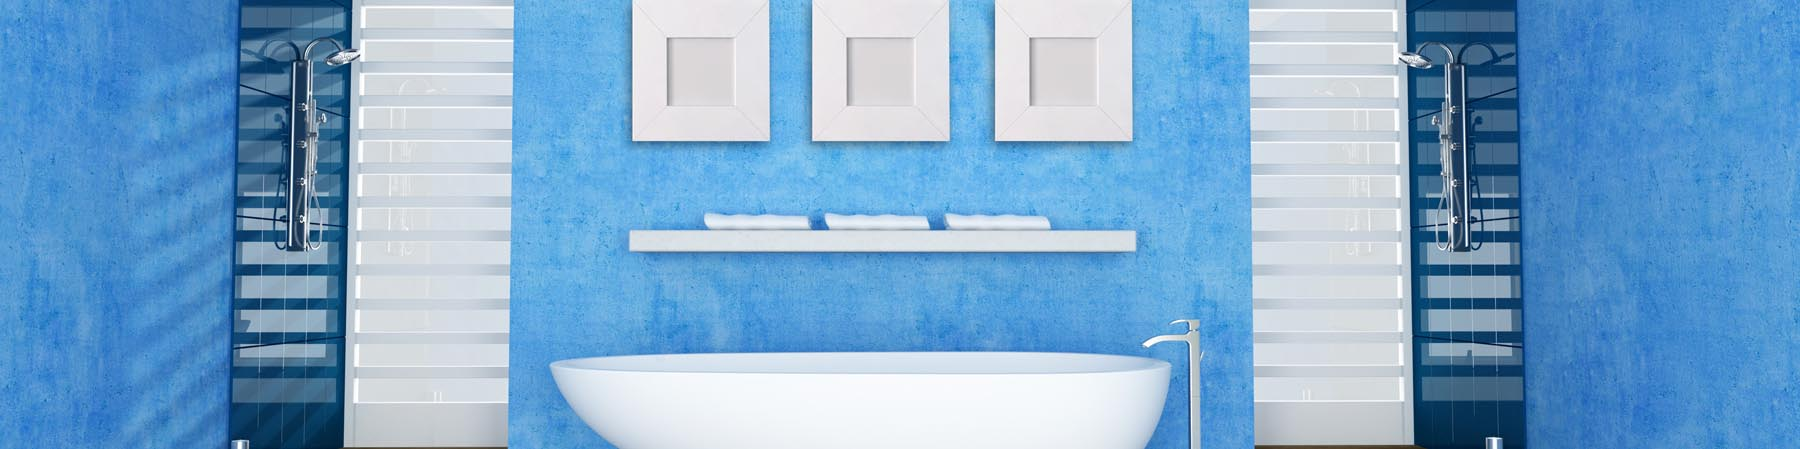 Rénovation Salle De Bain Morlaix rénovation salle de bain à plourin-lès-morlaix | yannick